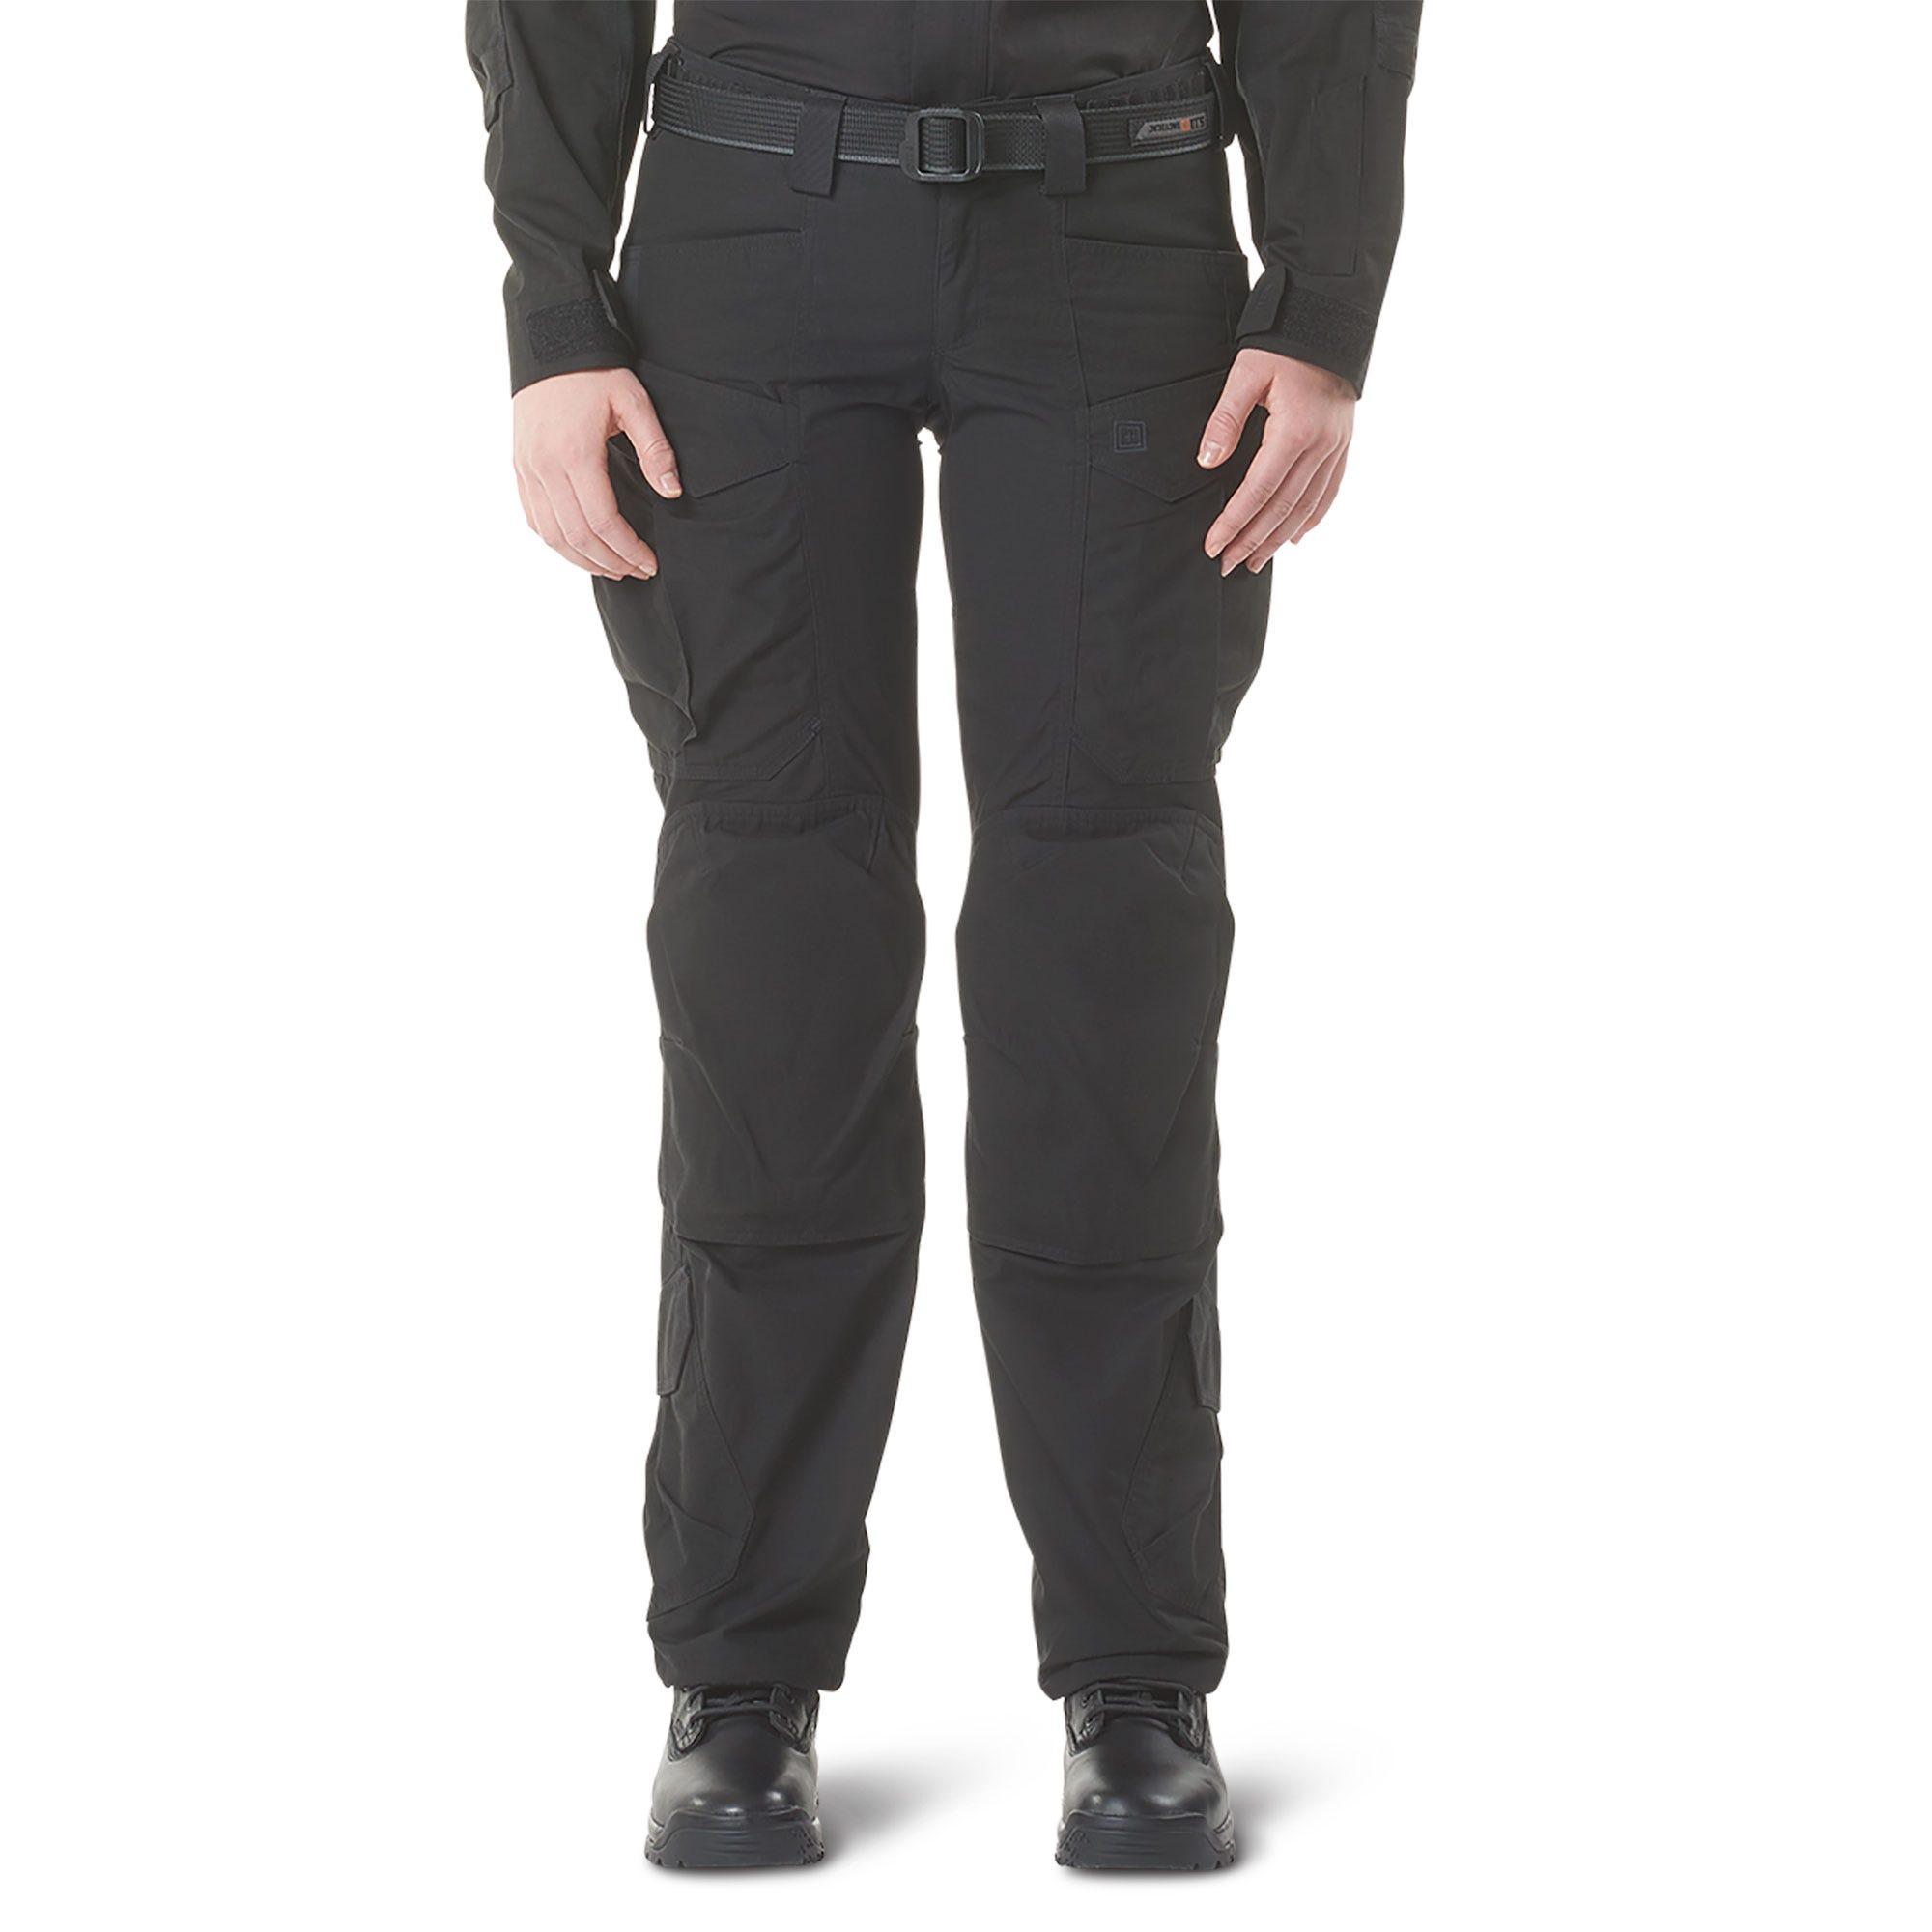 3ee3b00f3ad  199.99 199.99. Women s XPRT Tactical Pant